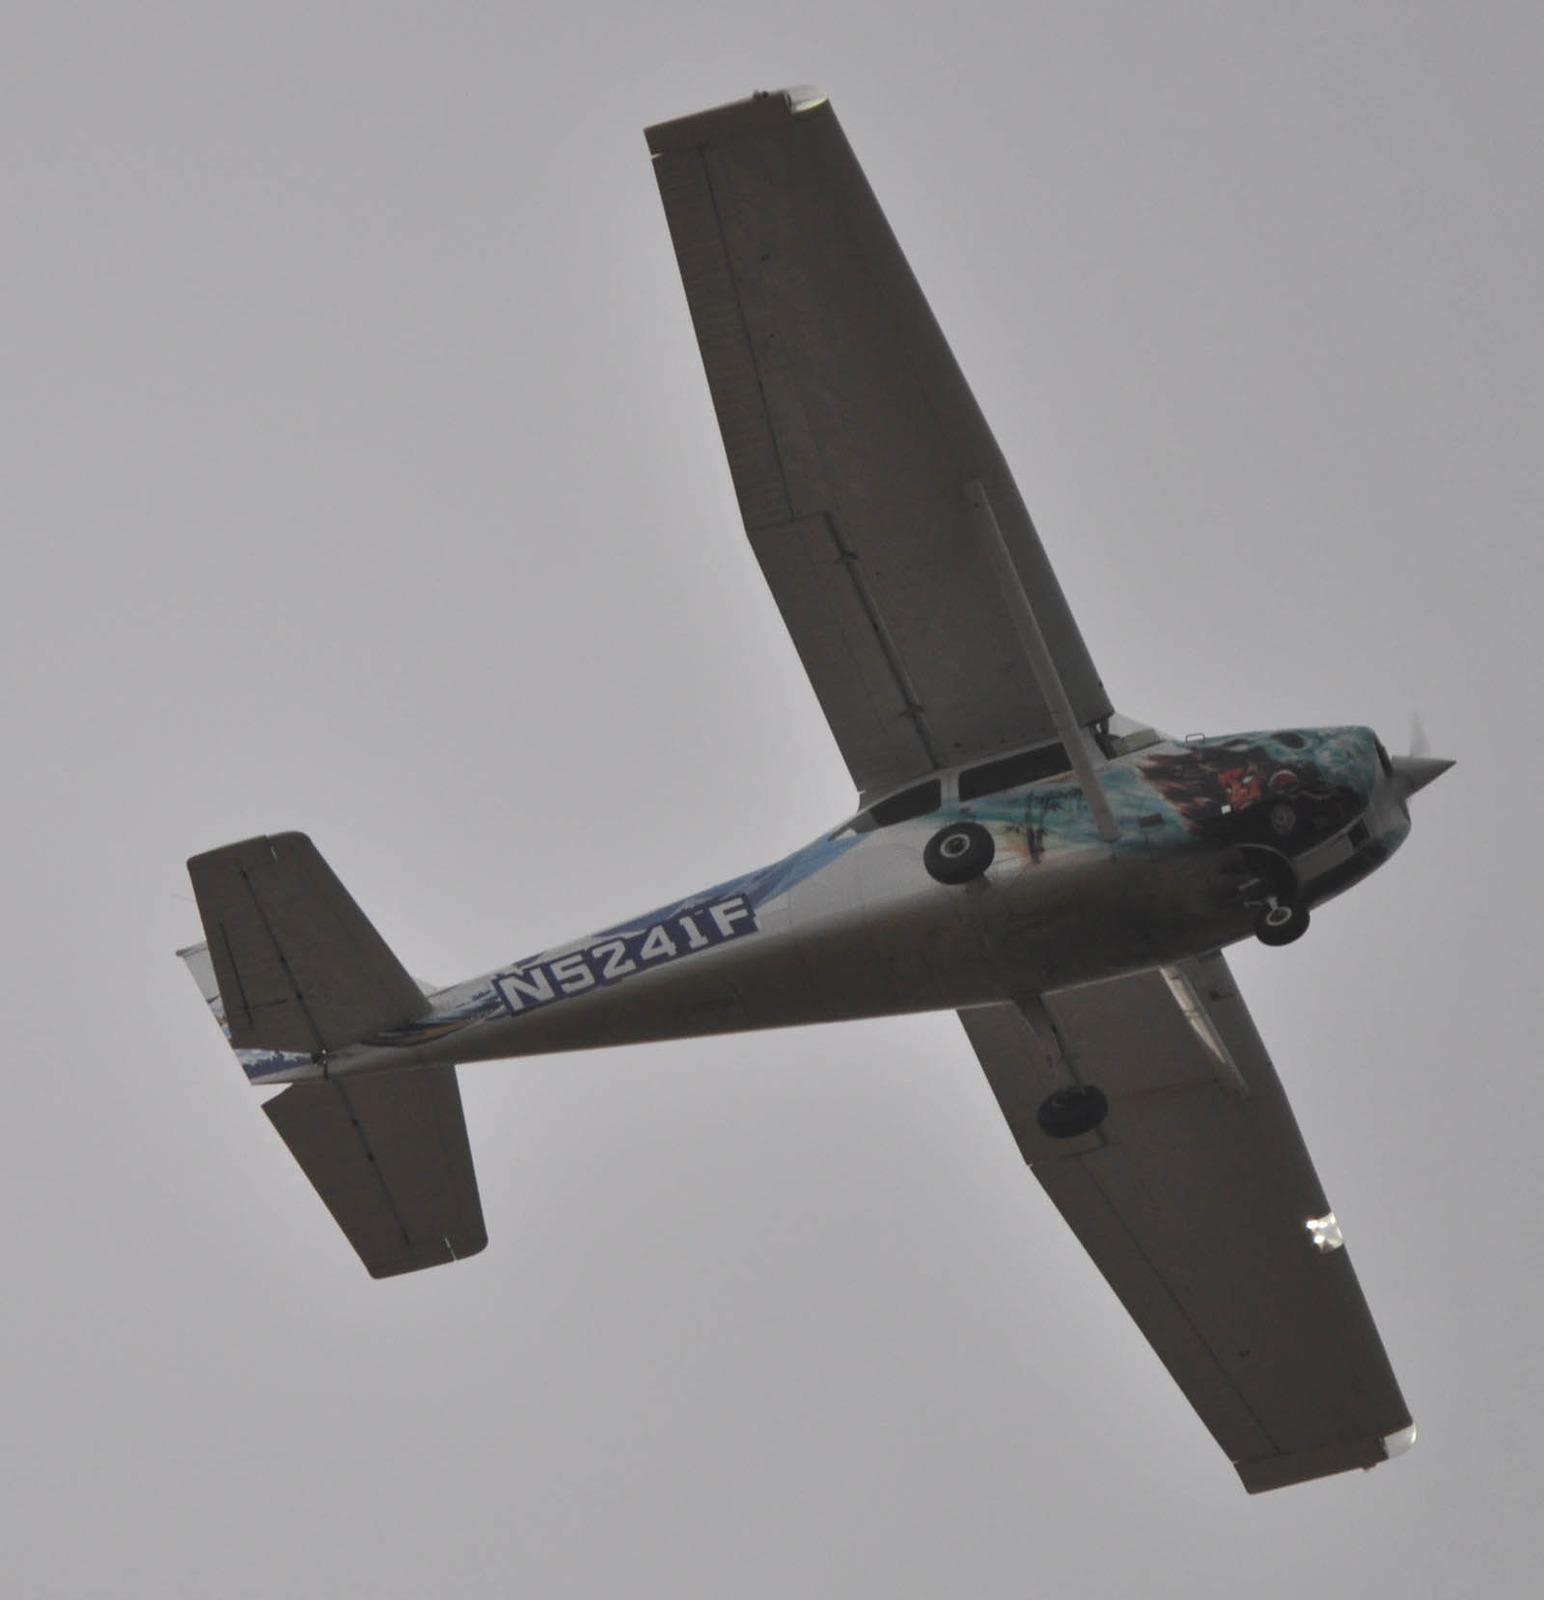 Cessna120104g832